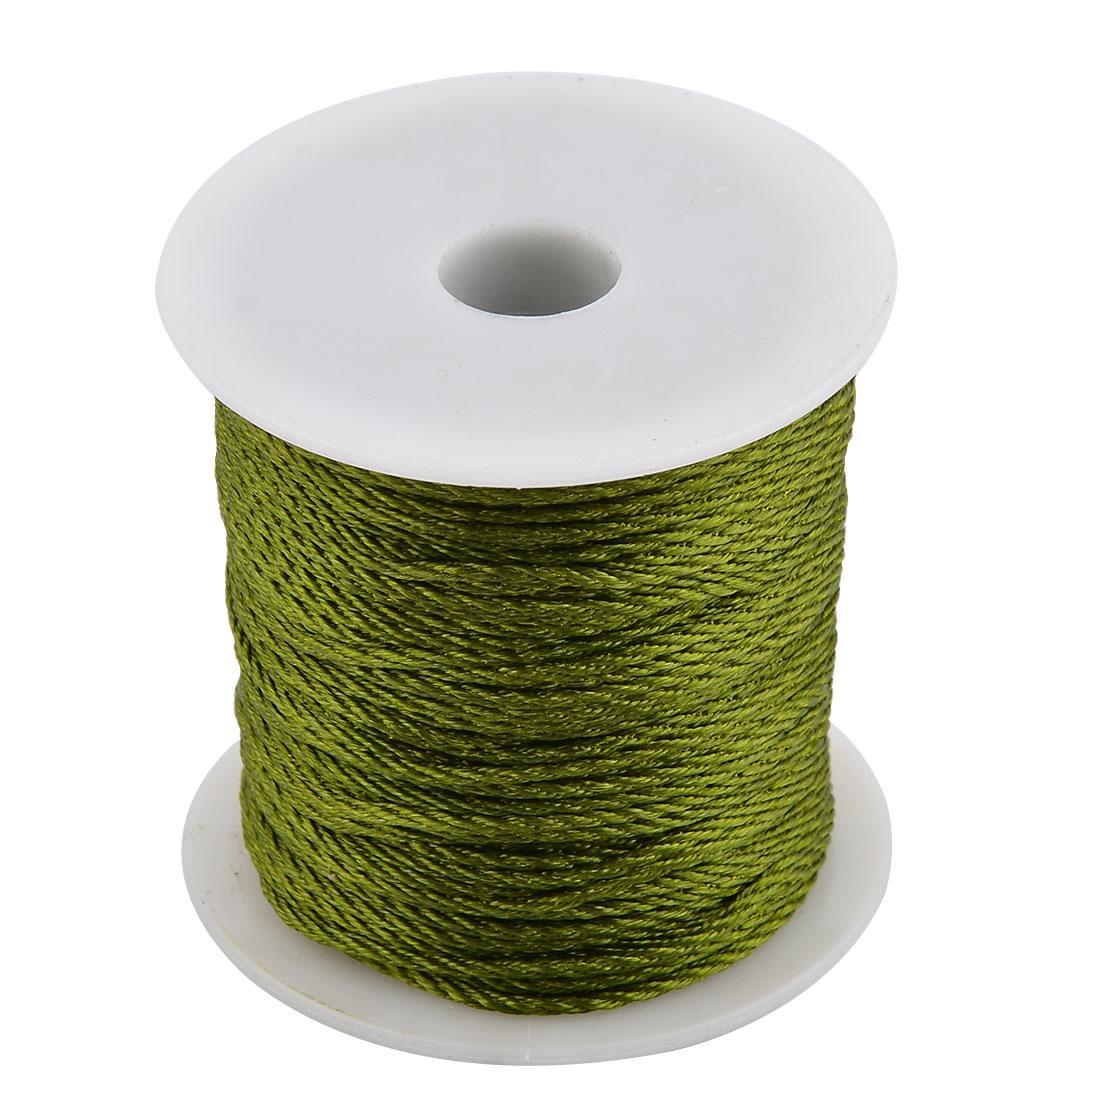 Nylon Handicraft DIY Chinese Knot Bracelet Cord String Rope Army Green 55 Yards